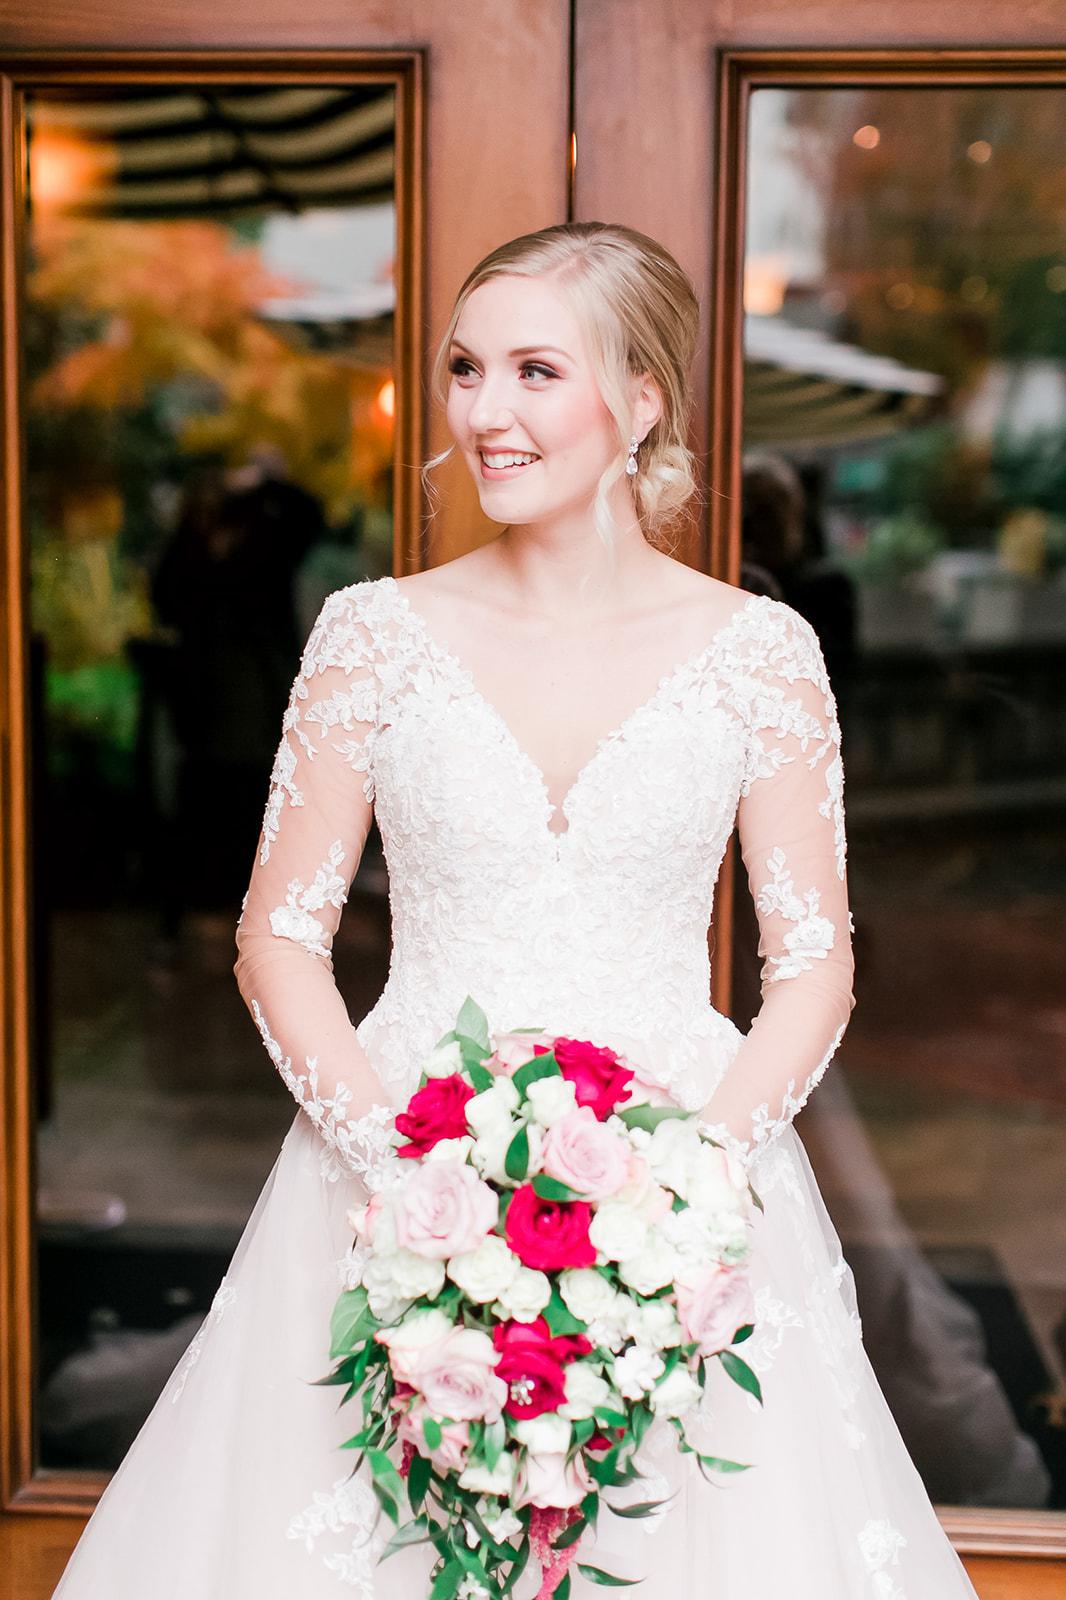 A Melrose Market Studios Seattle Washing Wedding - The Overwhelmed Bride Wedding Inspiration Ideas Wedding Blog